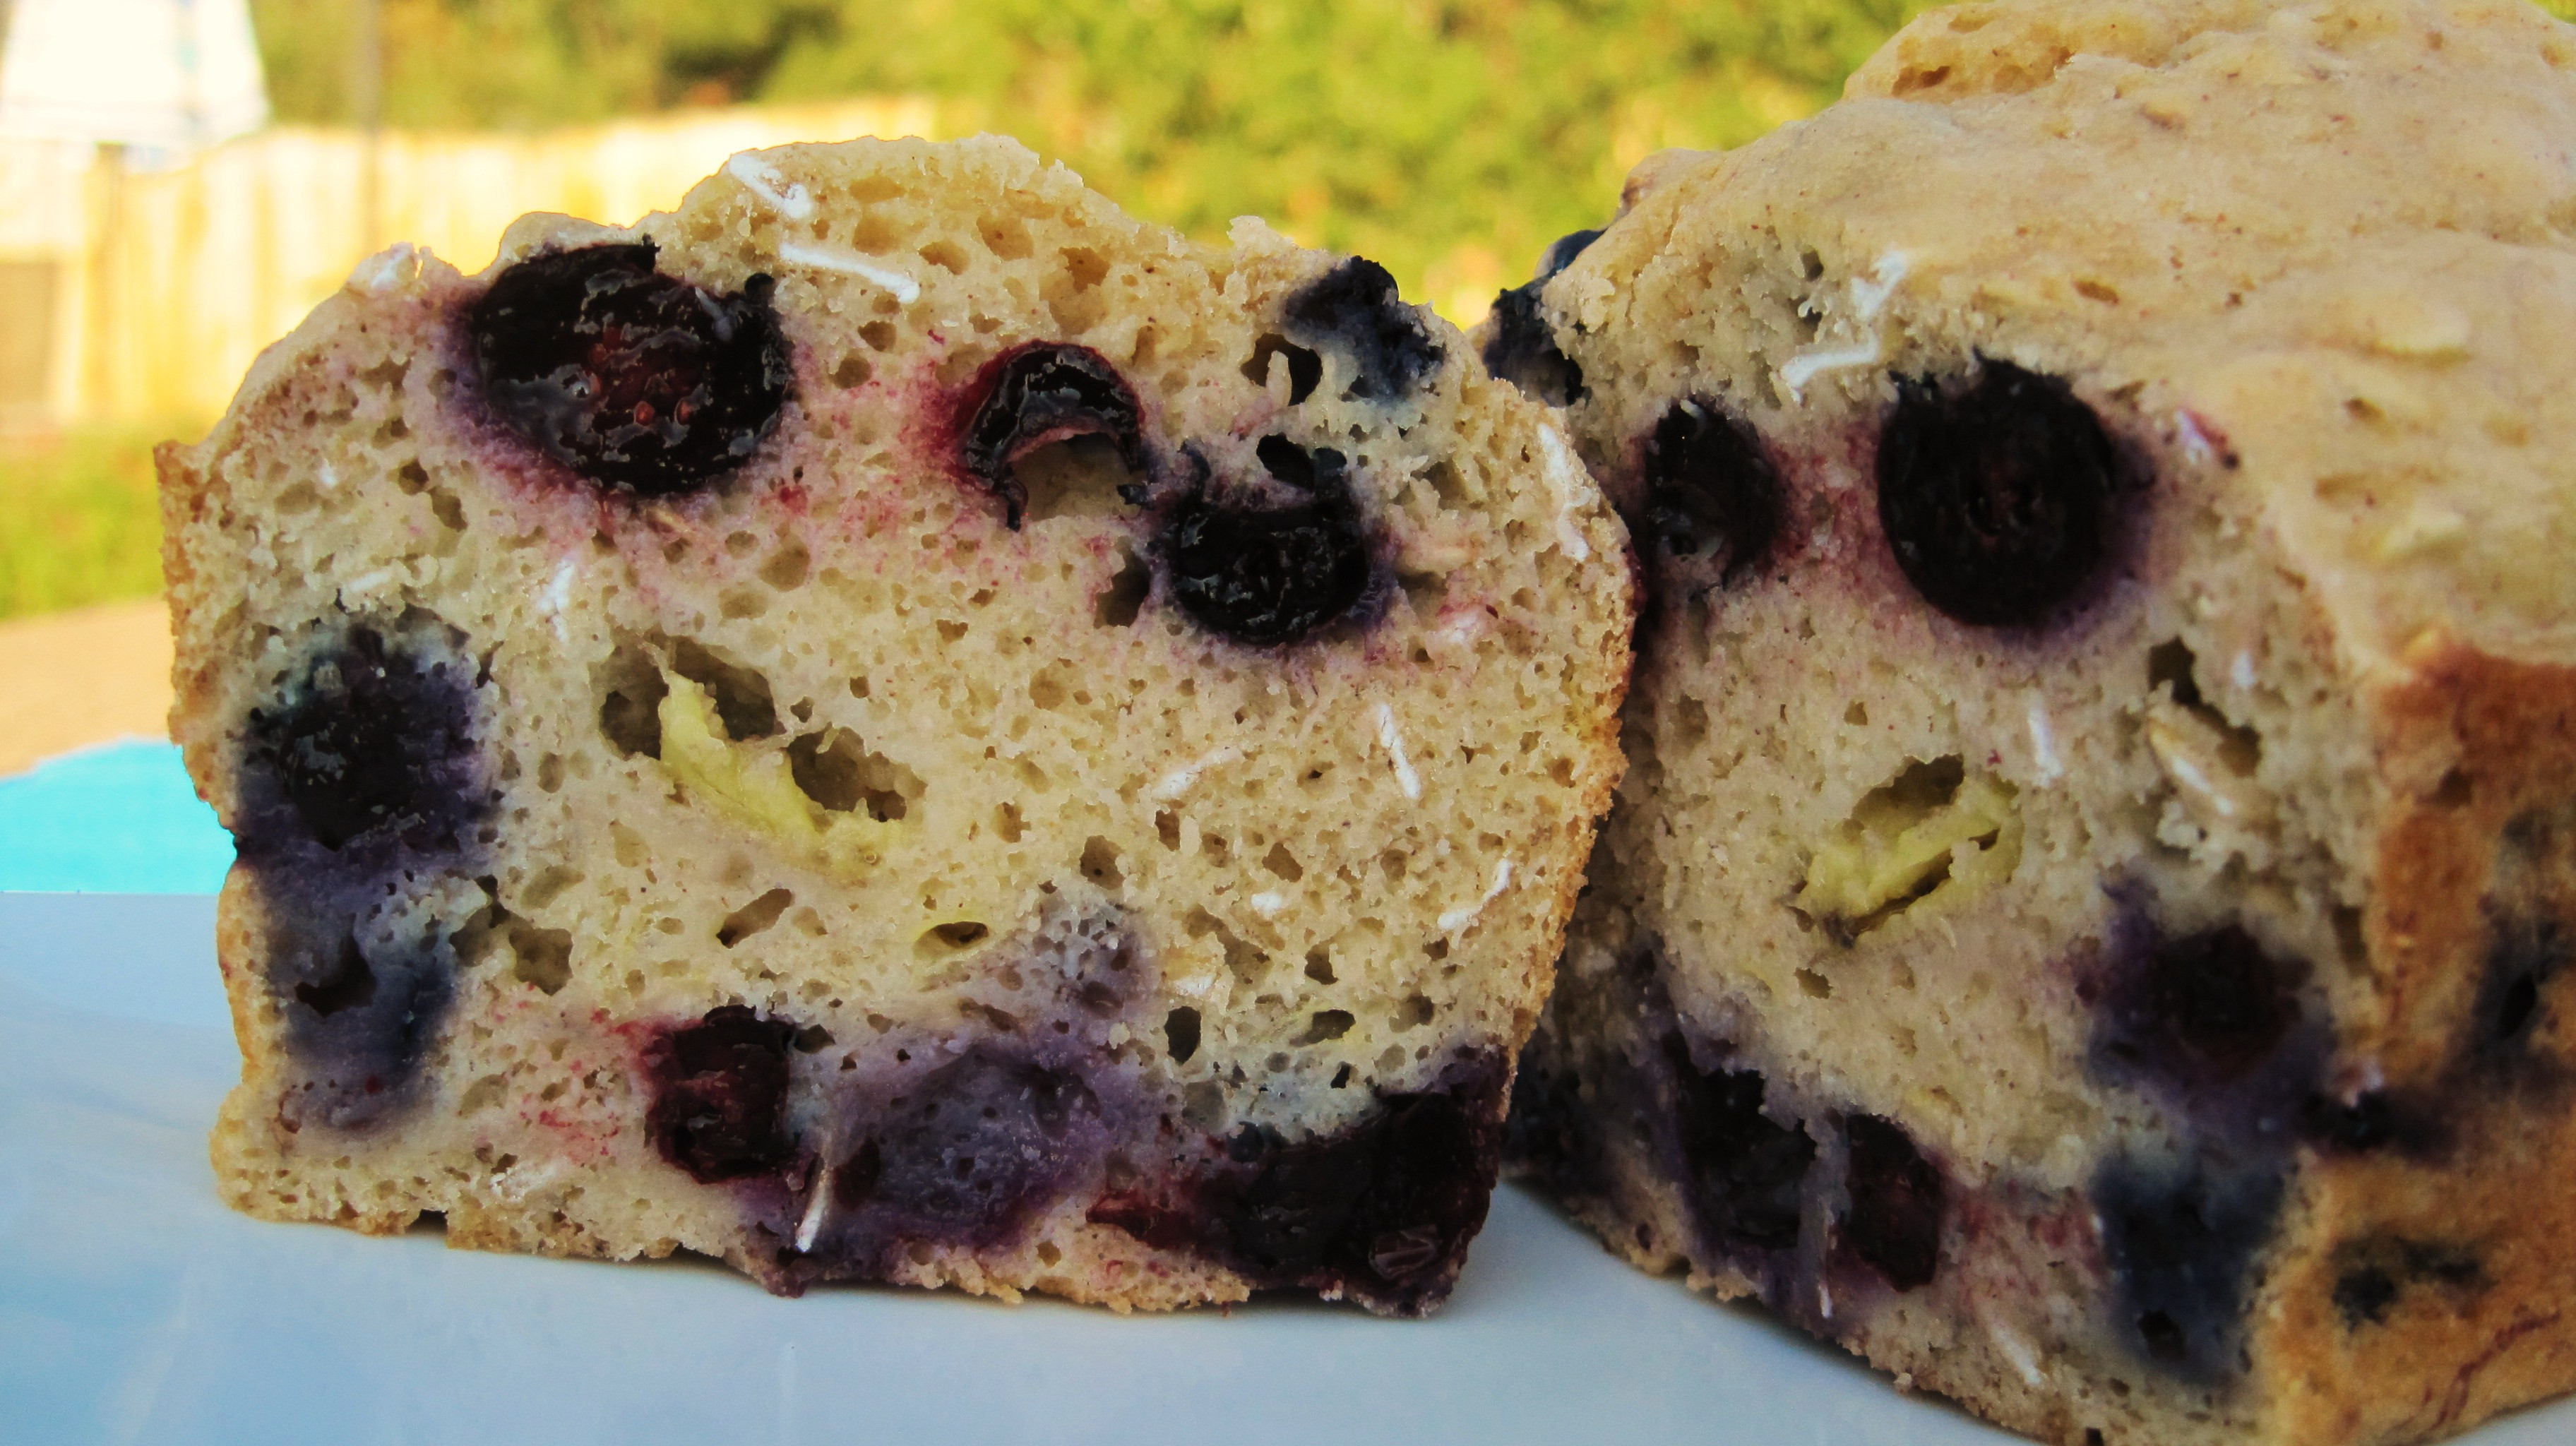 Banana Blueberry Bread Healthy  Healthy Banana Blueberry Bread & A Tasty Flop